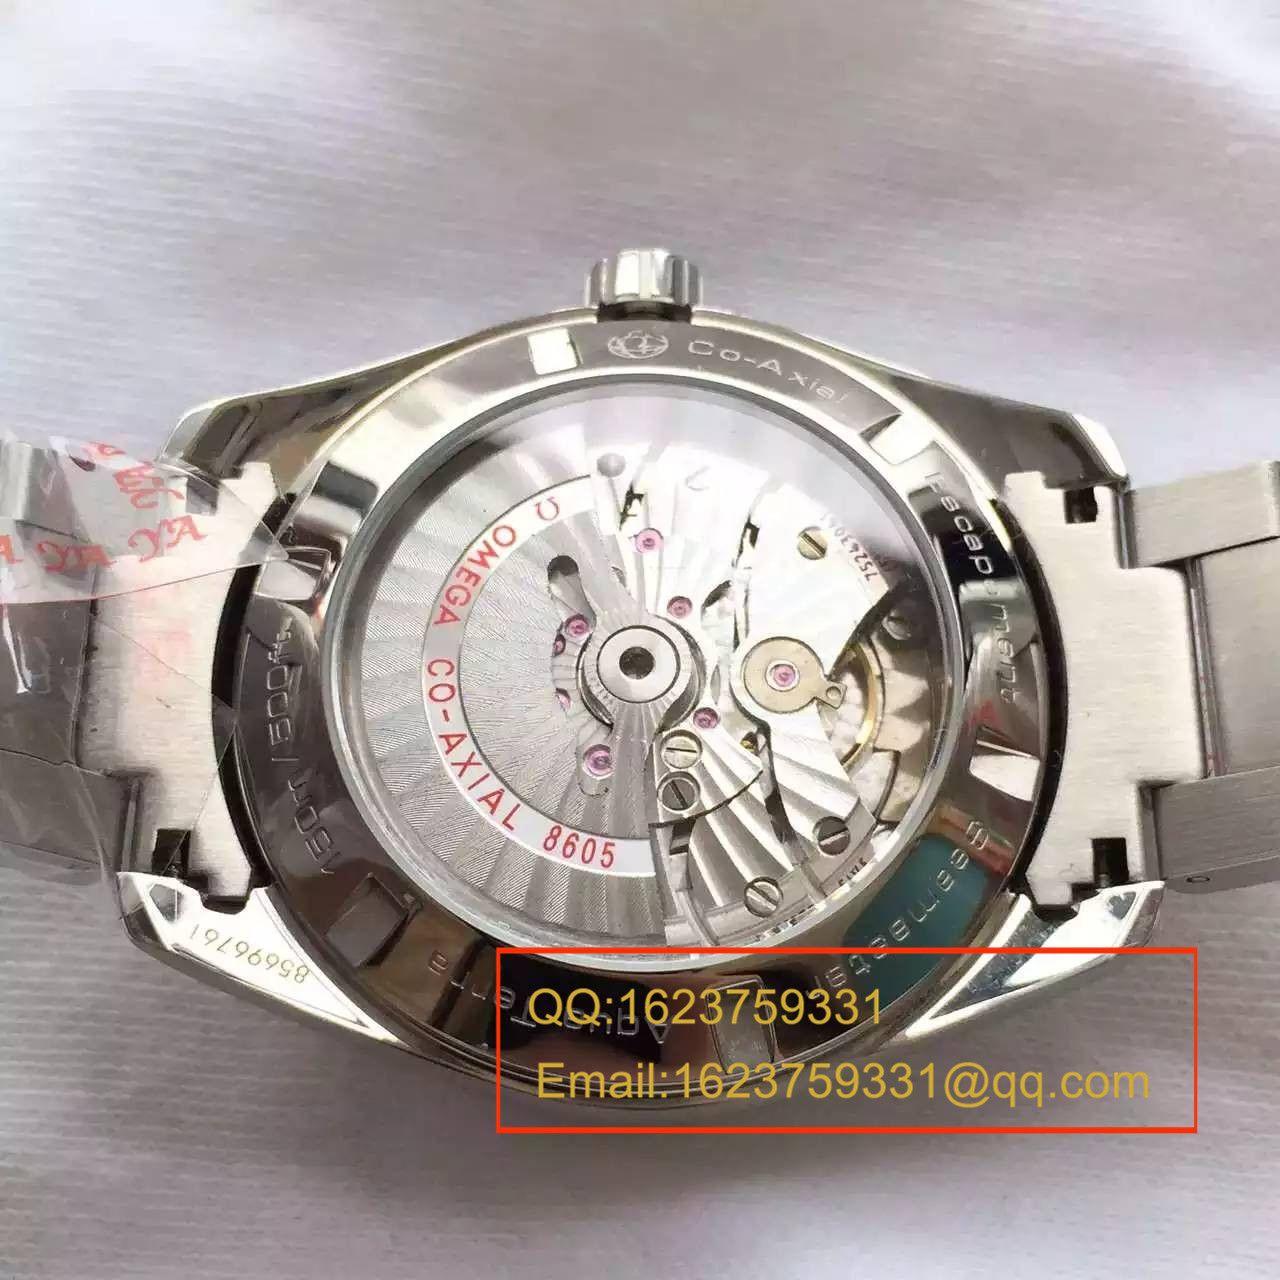 【KW厂一比一精仿手表】欧米茄海马系列231.10.43.22.01.001机械手表